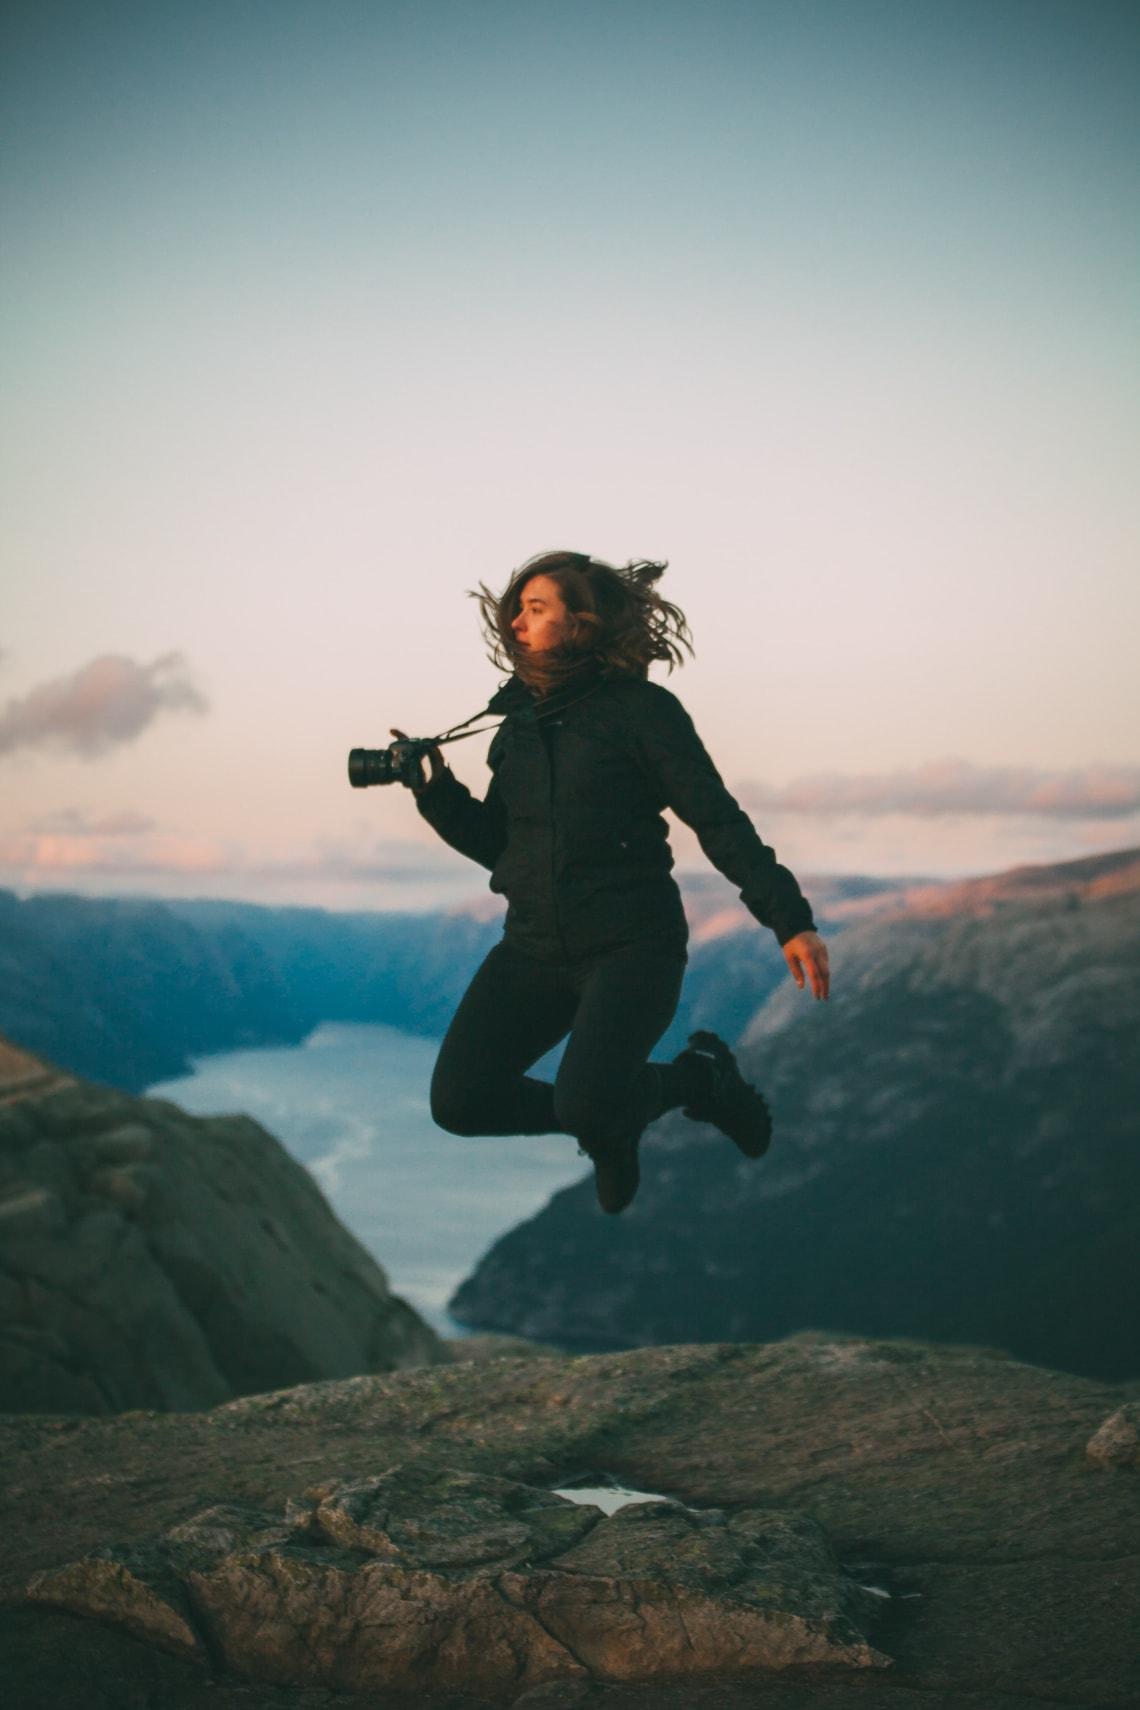 Self-development travel